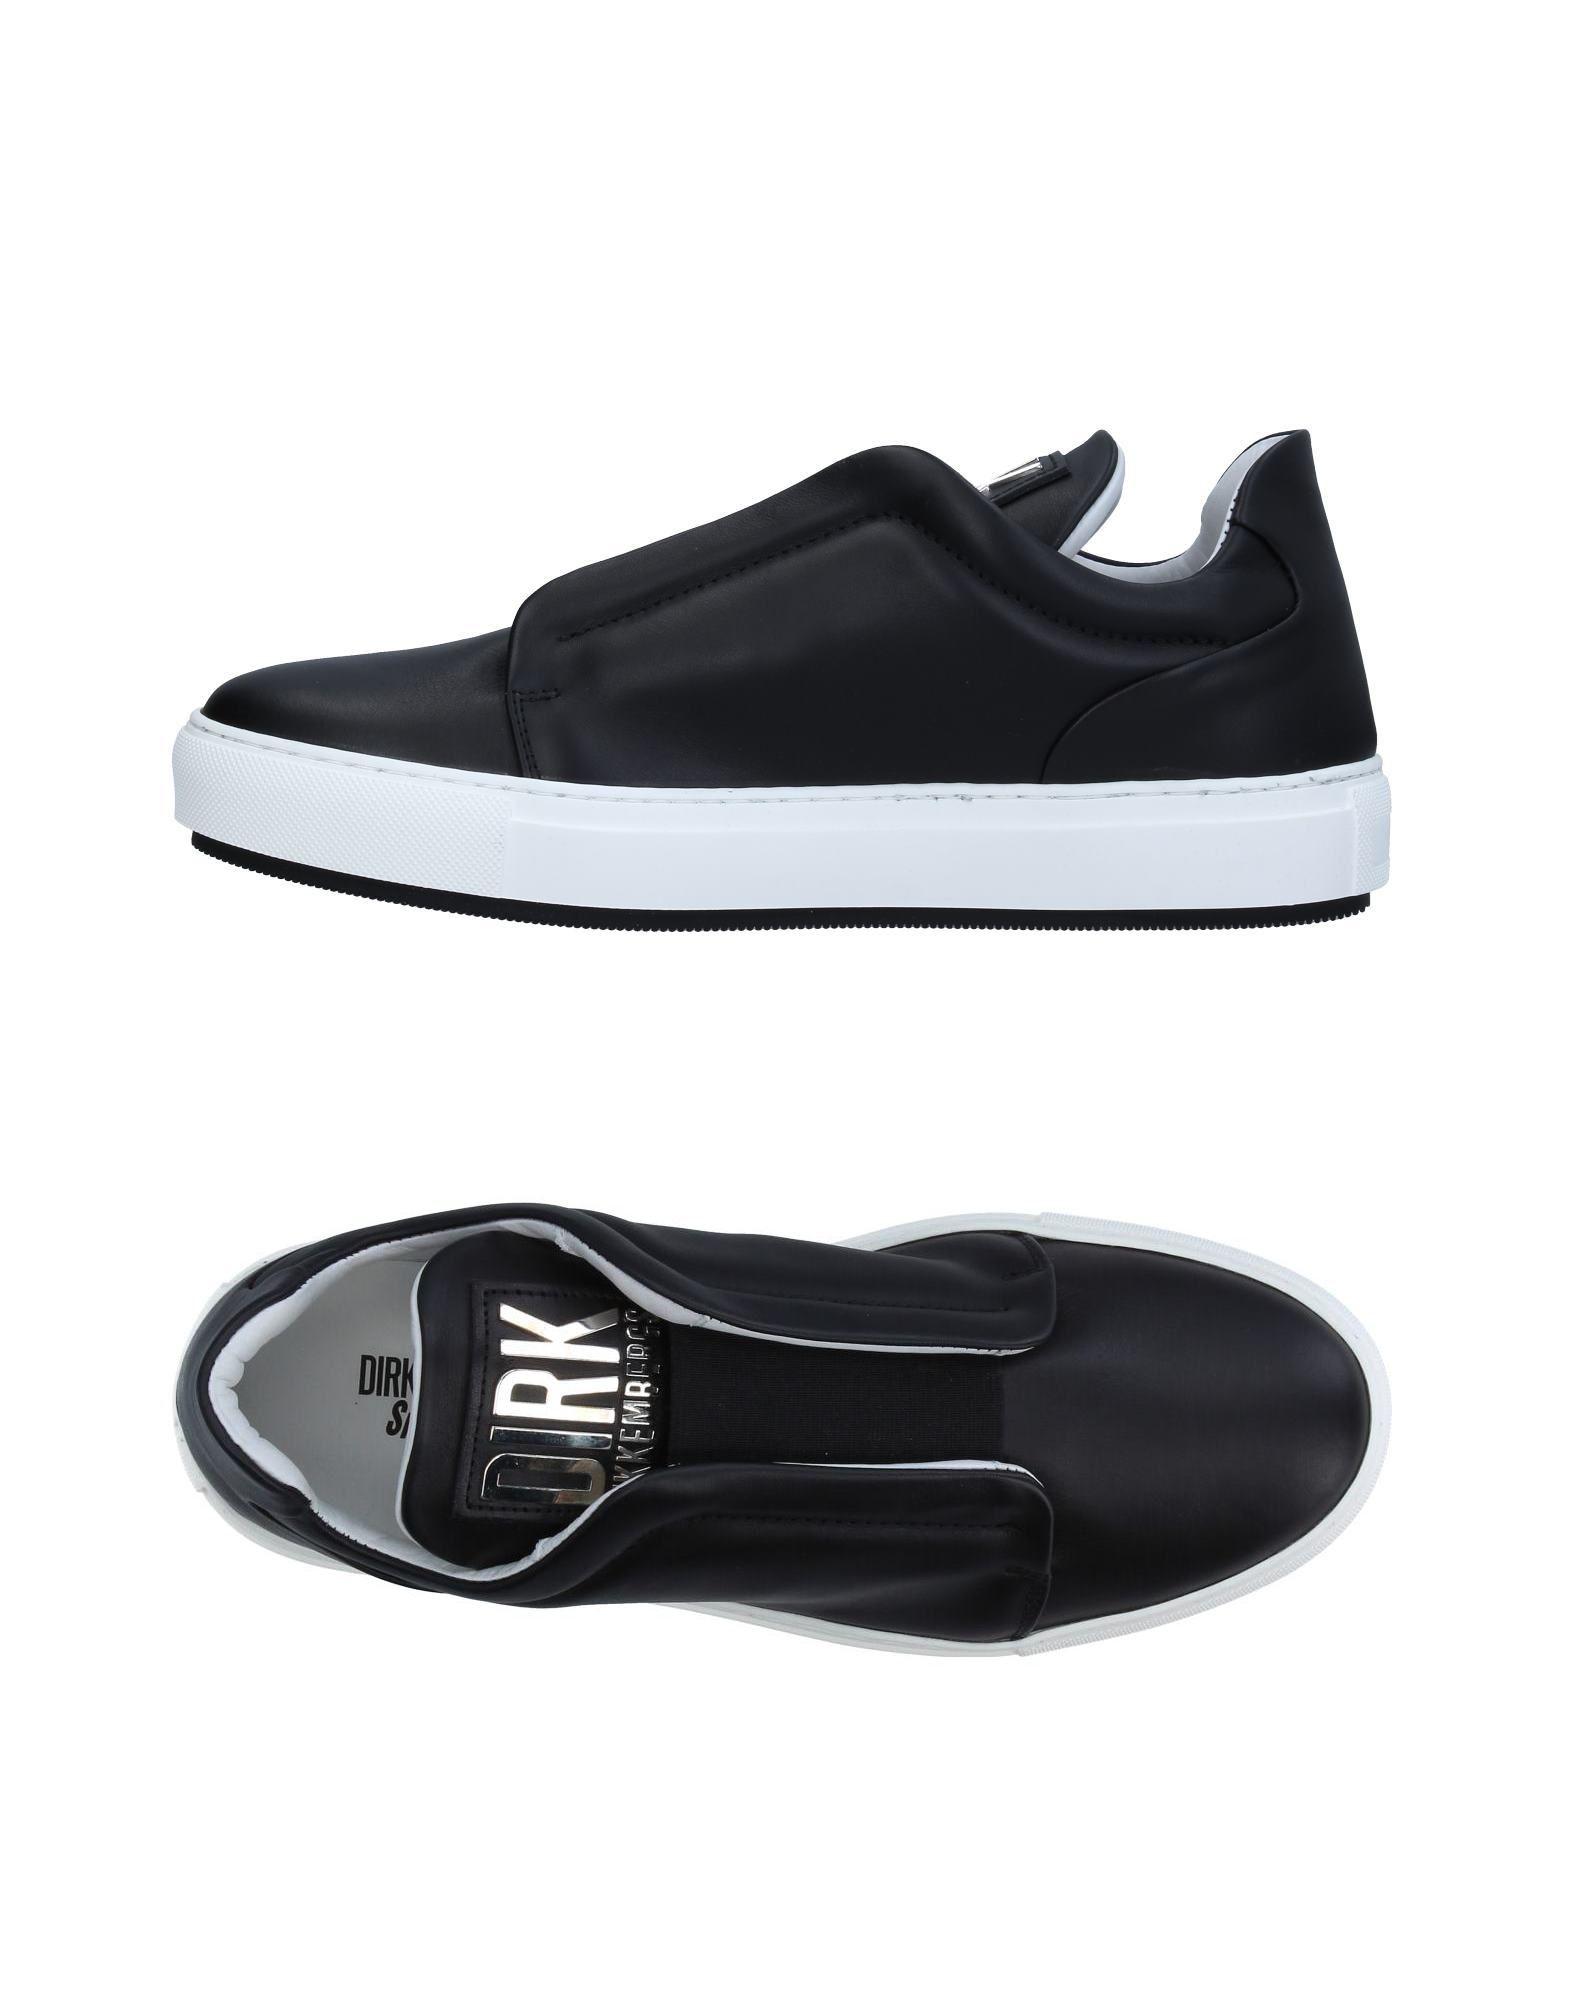 Sneakers Dirk Bikkembergs Uomo - 11332547FG